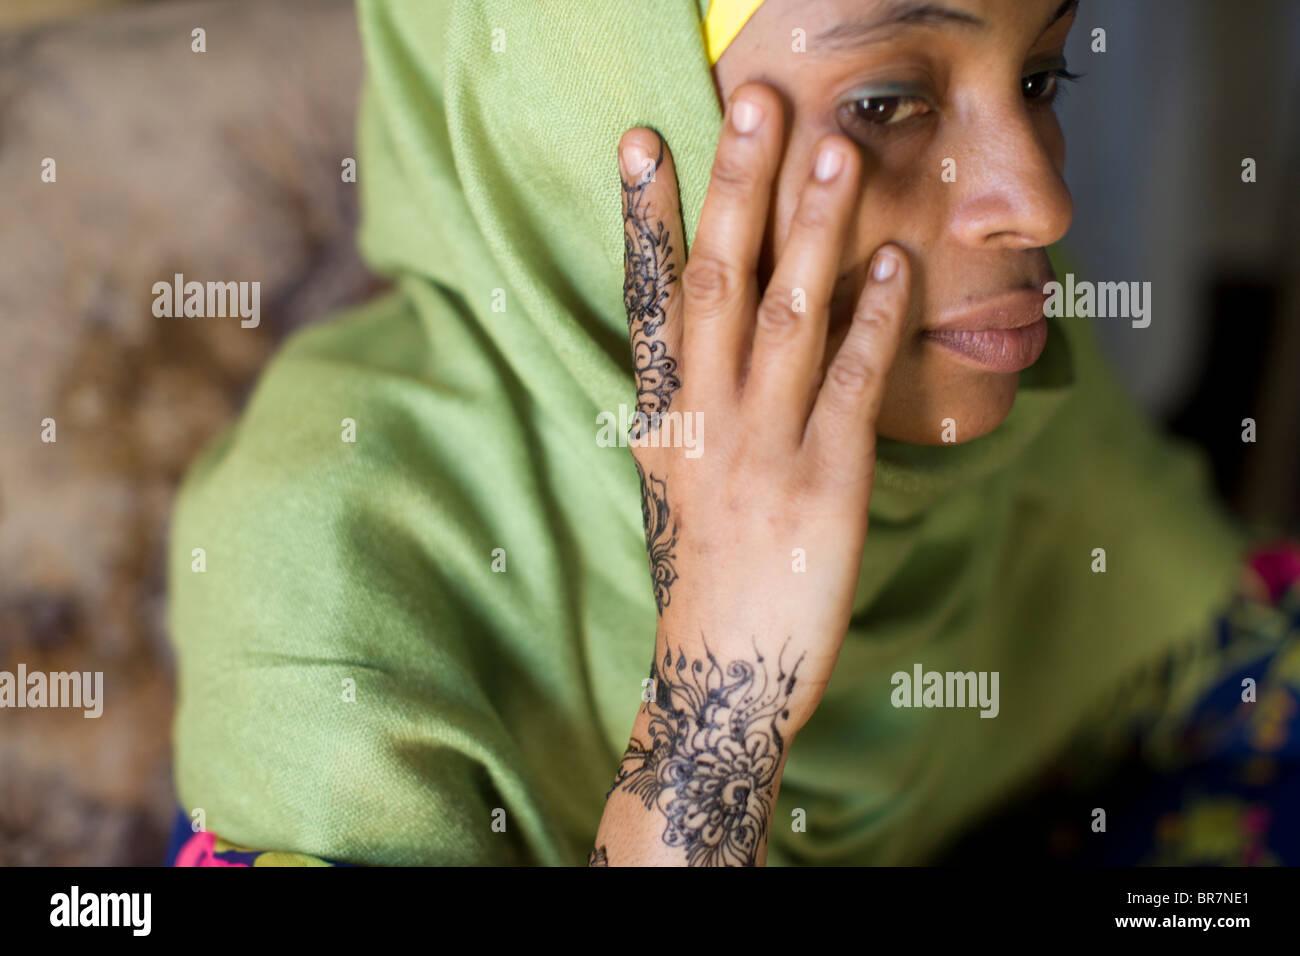 Young woman with henna art - Stonetown, Zanzibar, Tanzania. - Stock Image